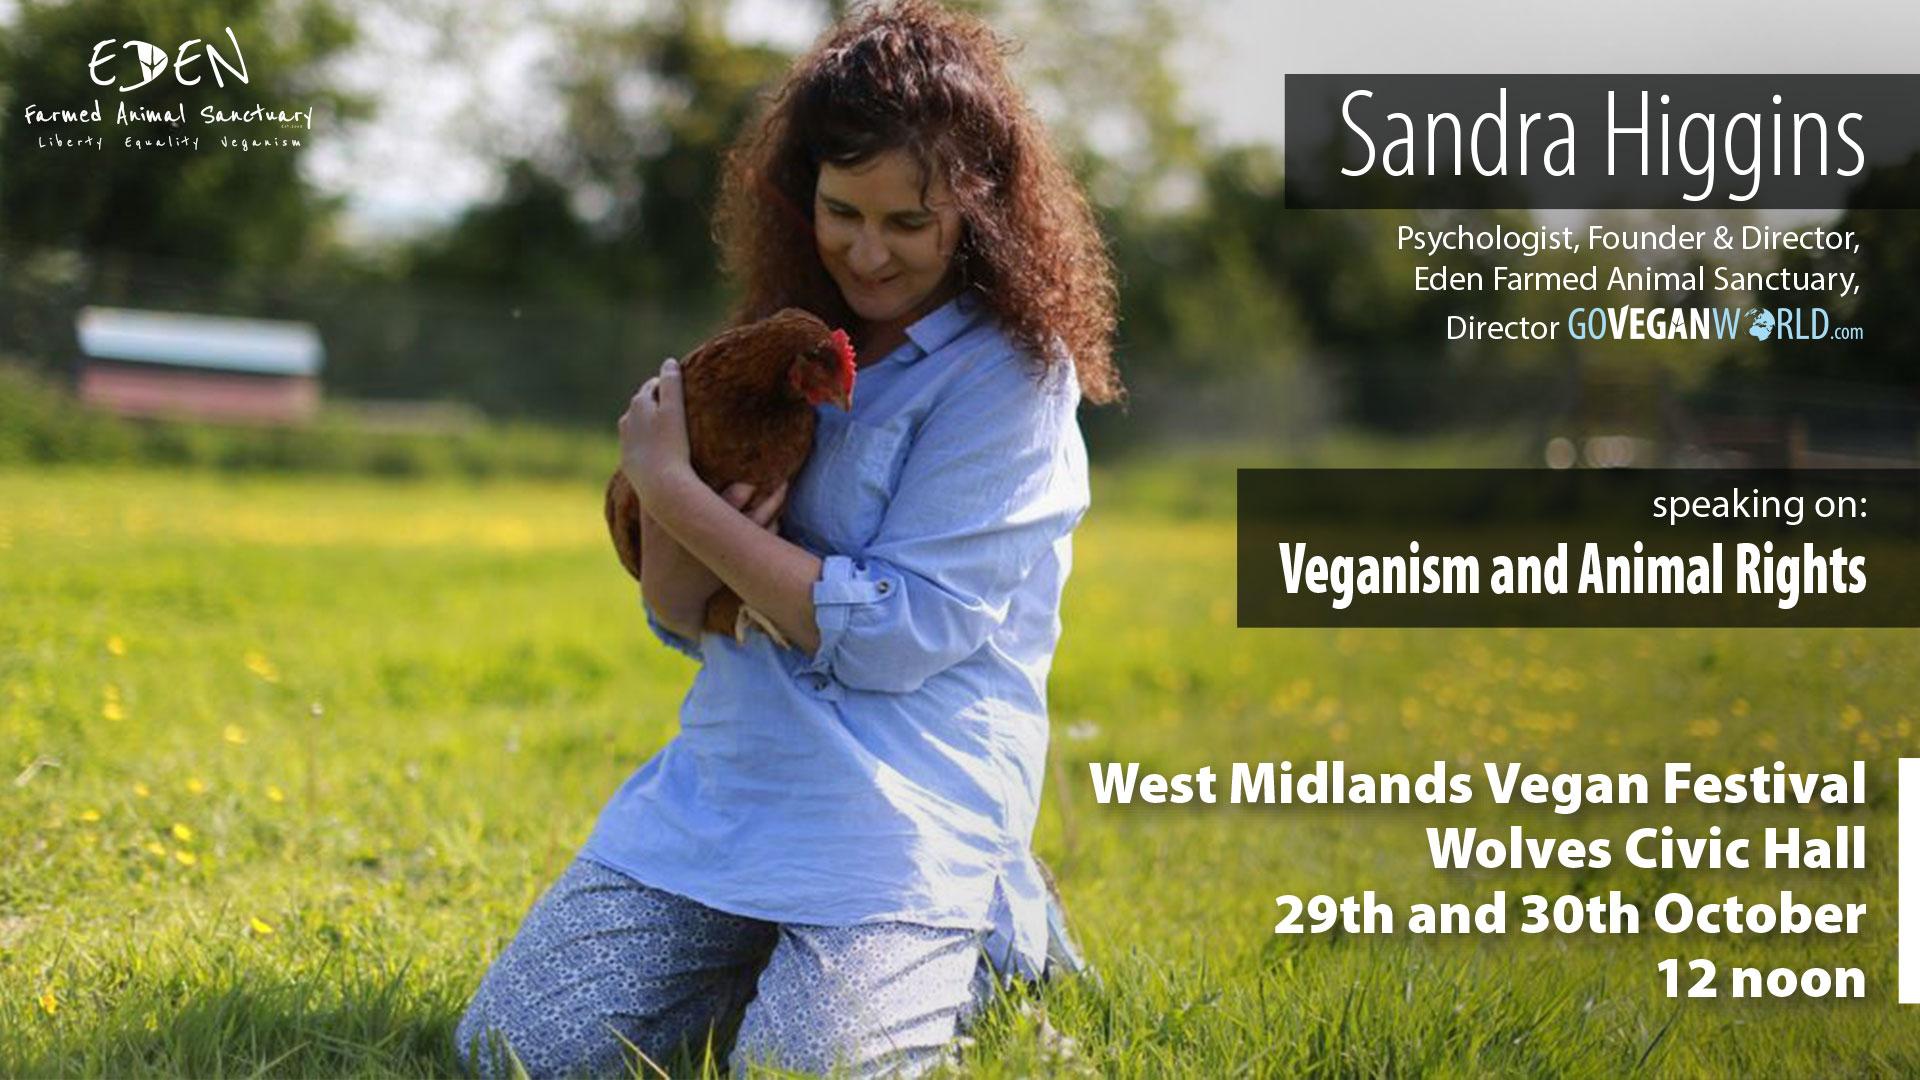 West Midlands Vegan Festival - Sandra Higgins talk on Veganism and animal rights